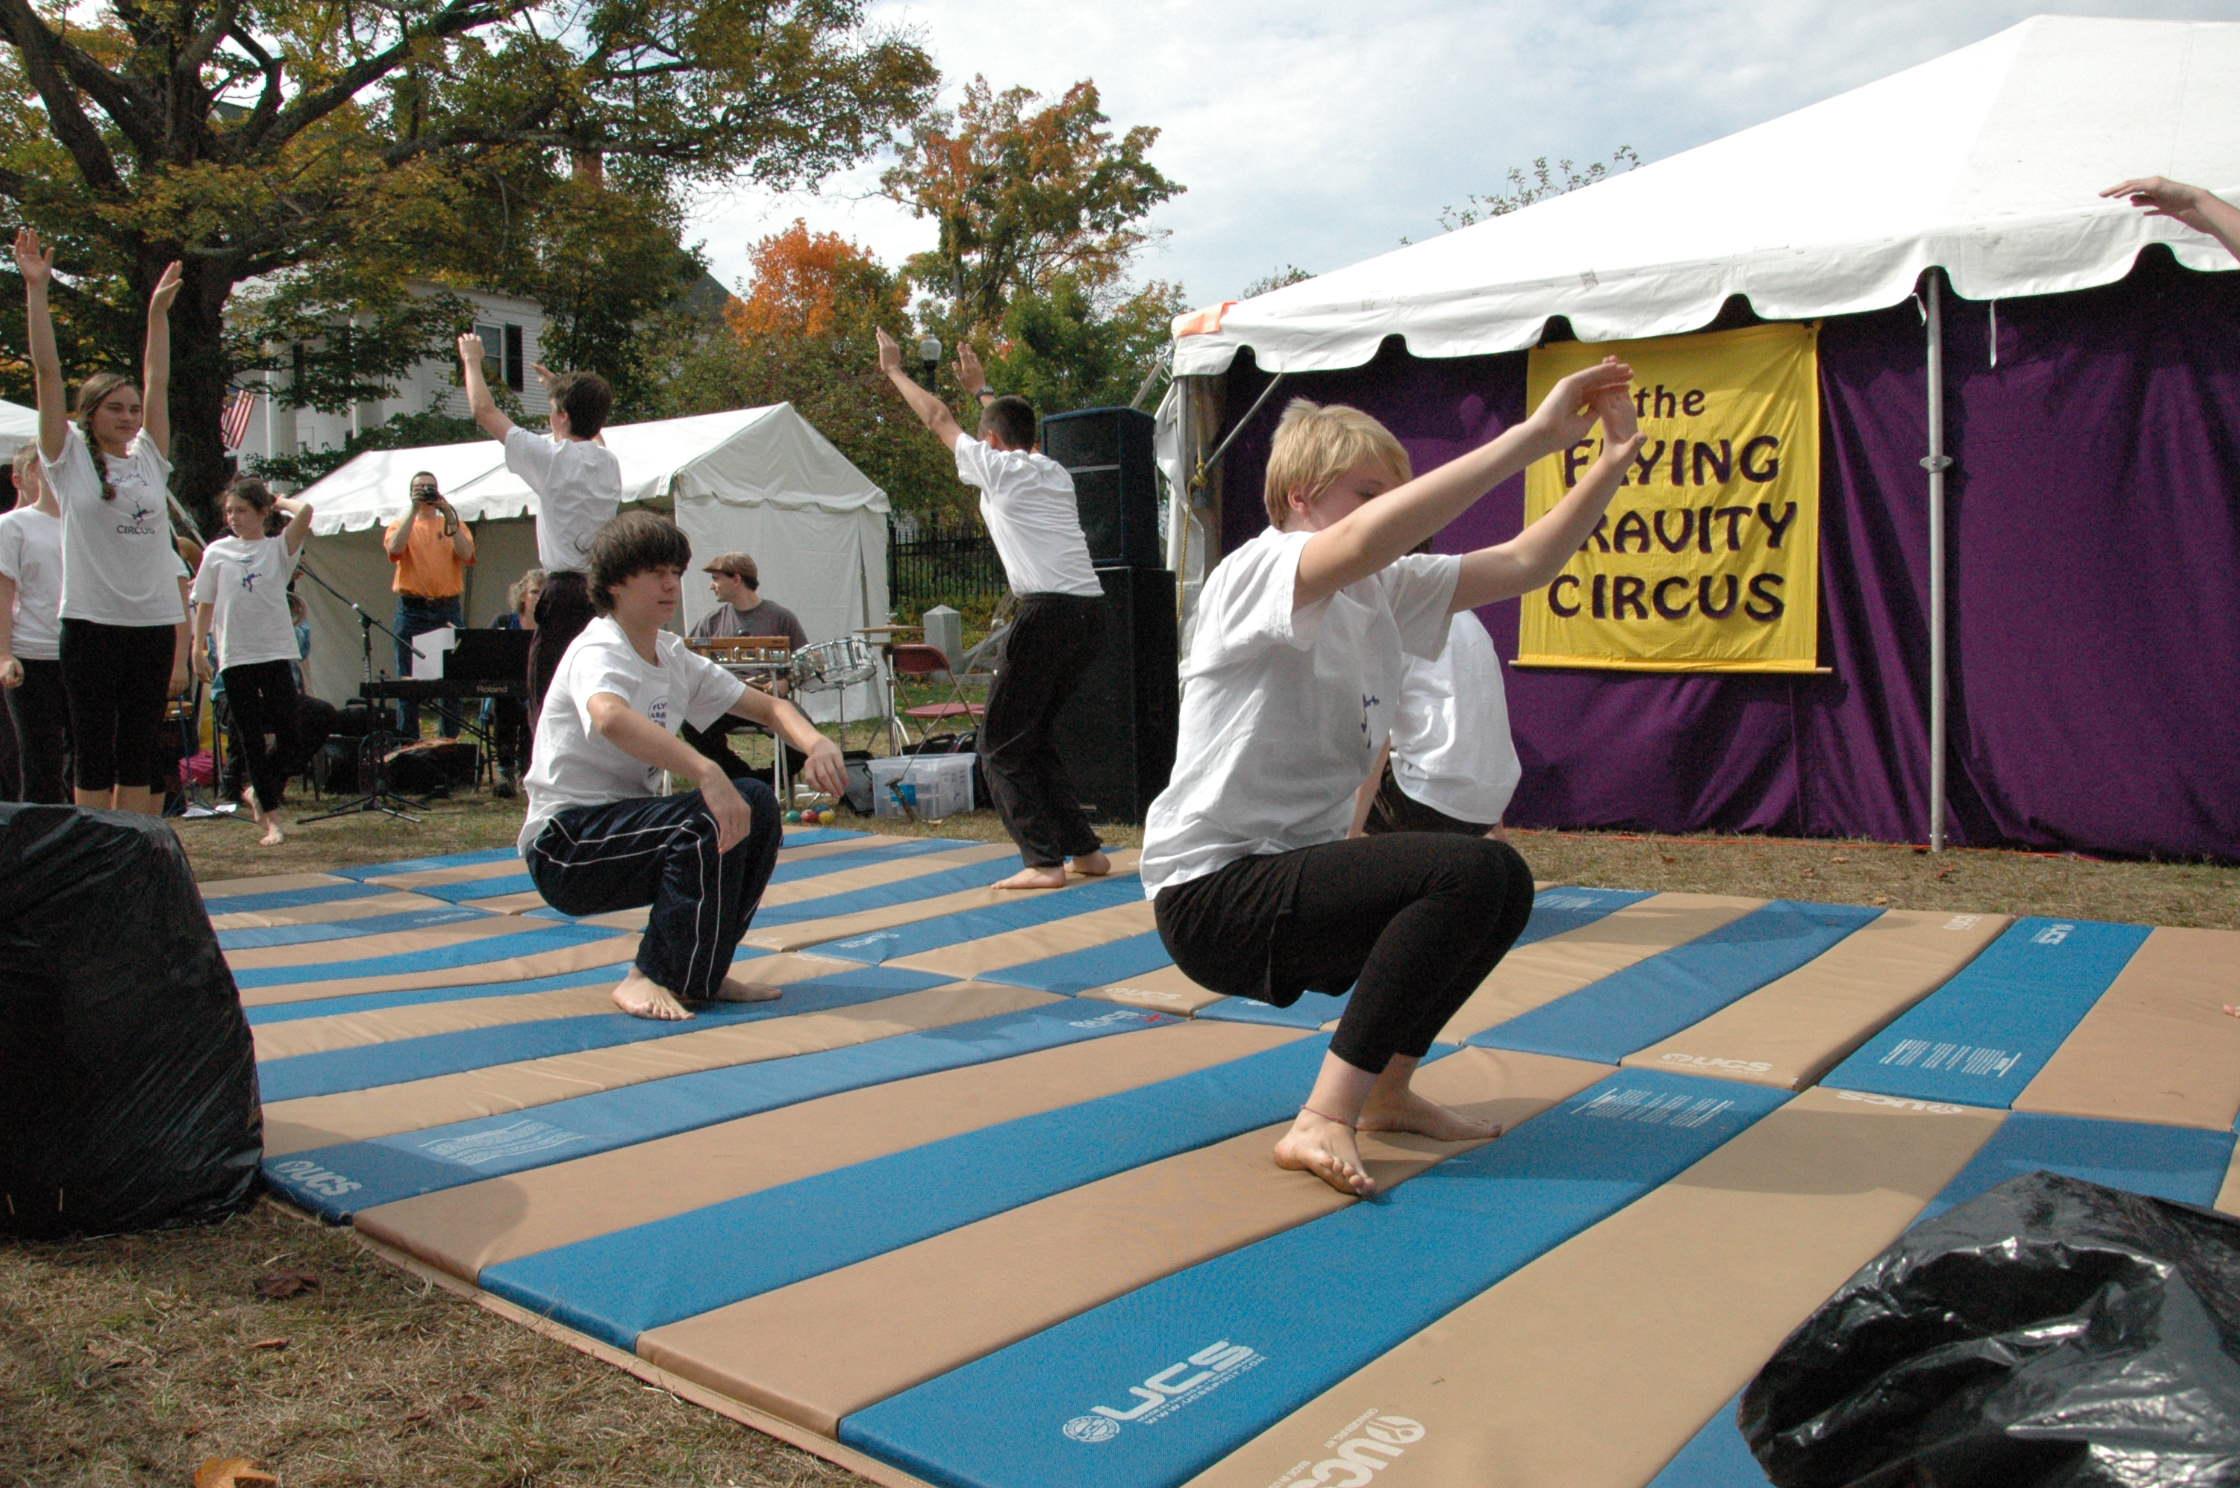 2012-10-06 Flyin Gravity Circus - Pumpkin 036.JPG